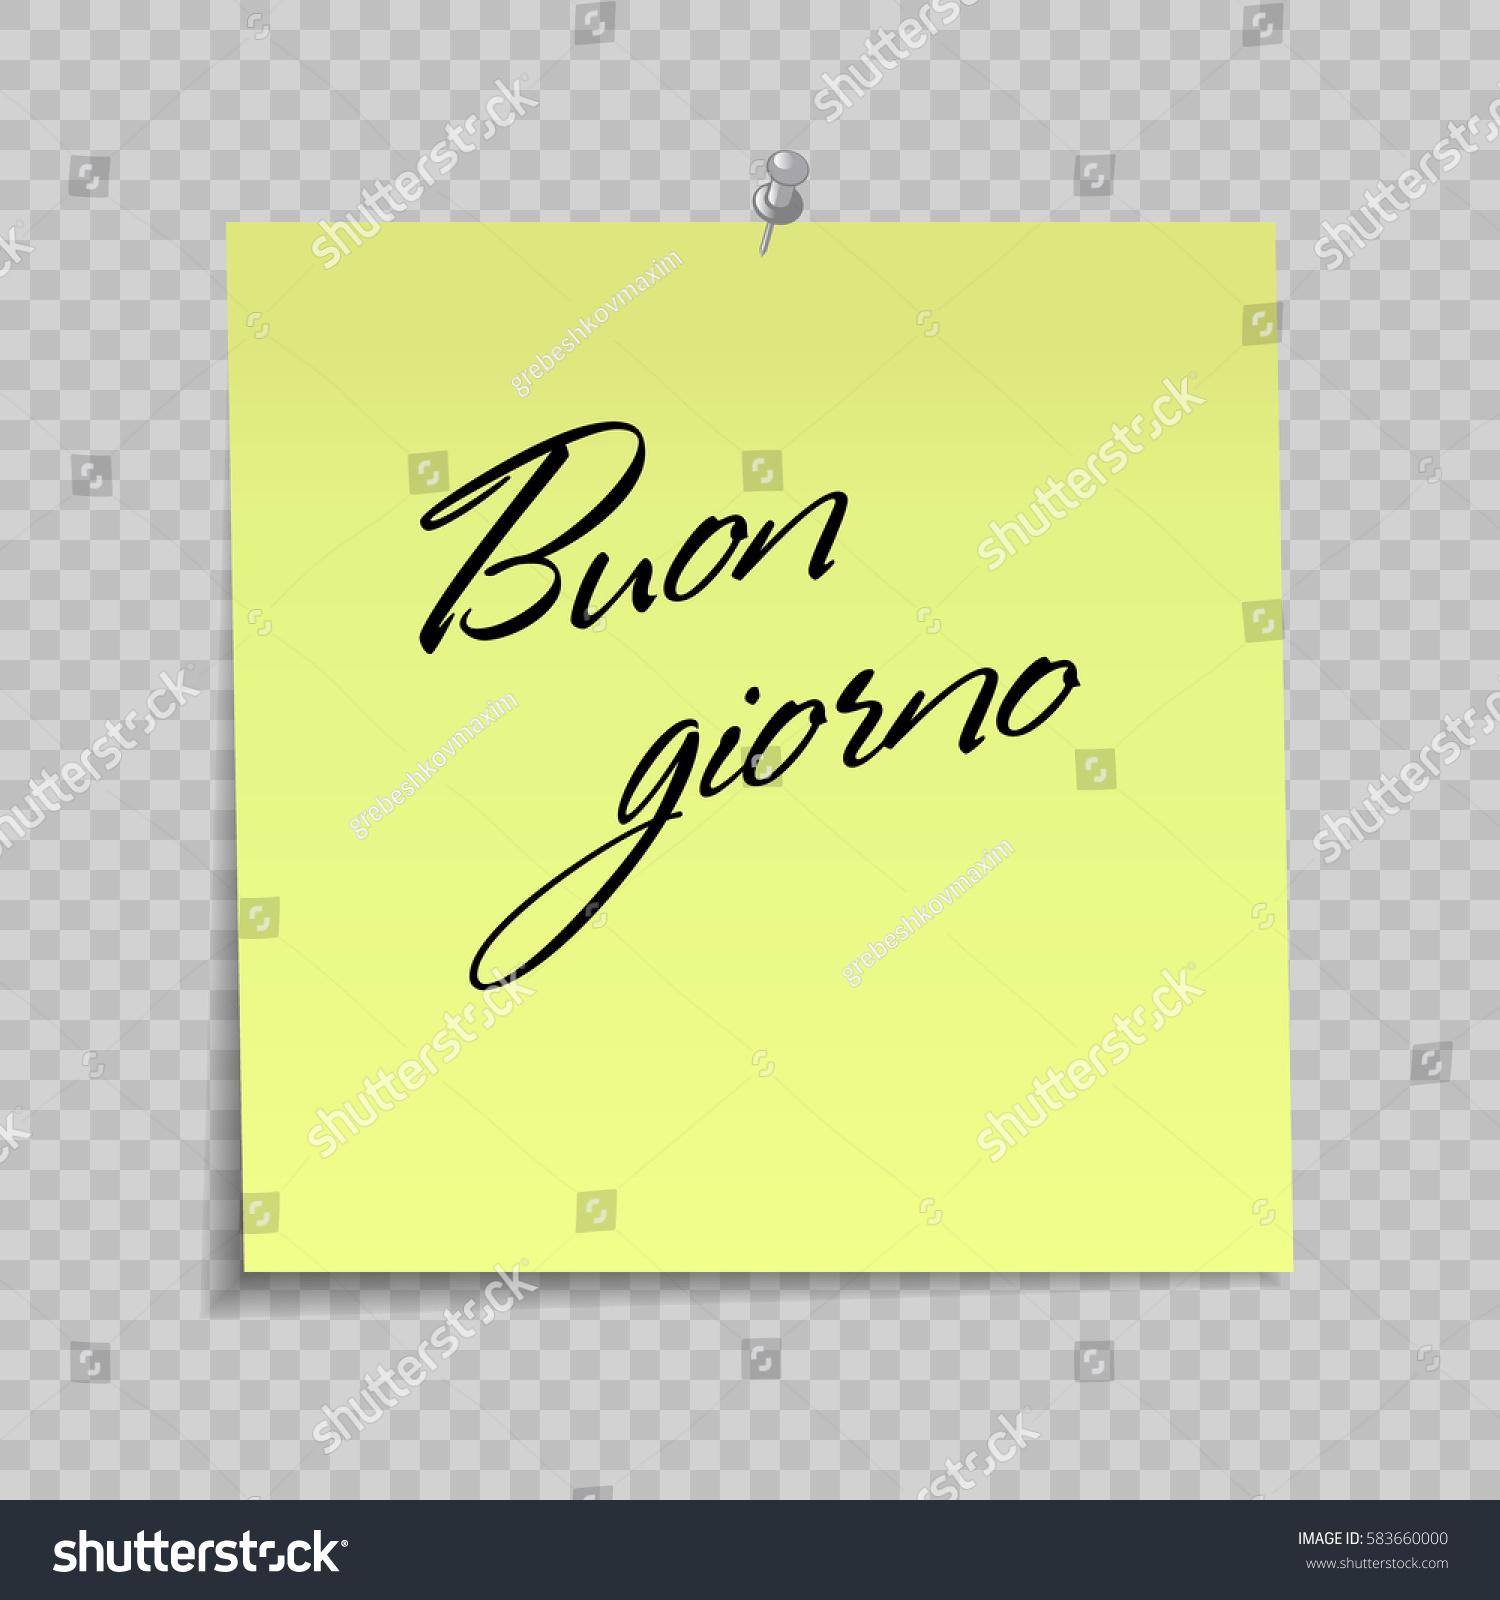 Yellow sticky note greeting message hello stock vector 583660000 yellow sticky note with greeting message hello on italian buon giorno m4hsunfo